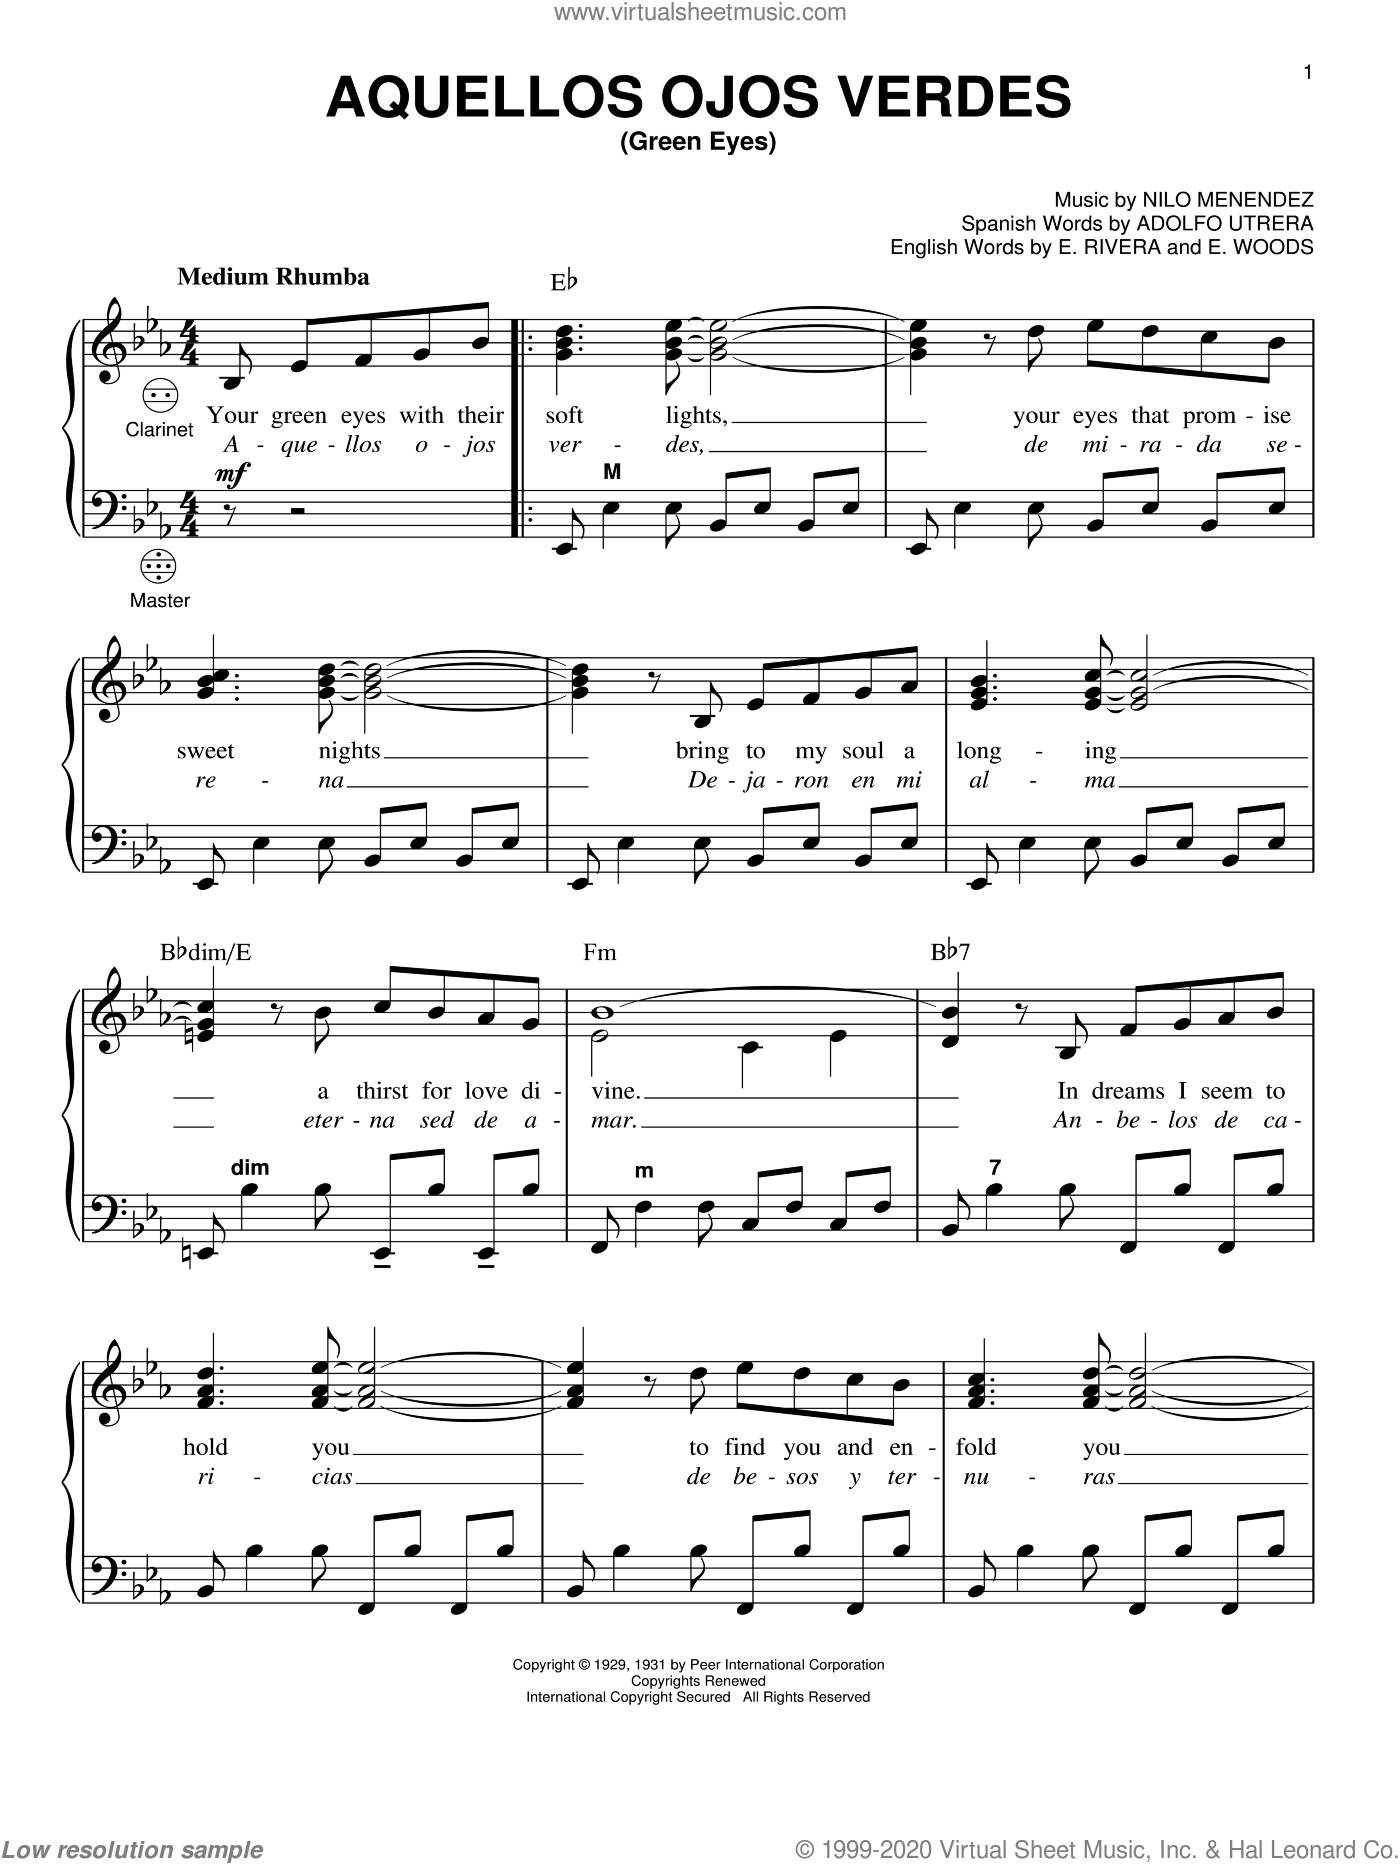 Aquellos Ojos Verdes (Green Eyes) sheet music for accordion by Nilo Menendez, Gary Meisner, Adolfo Utrera, E. Rivera and E. Woods, intermediate skill level